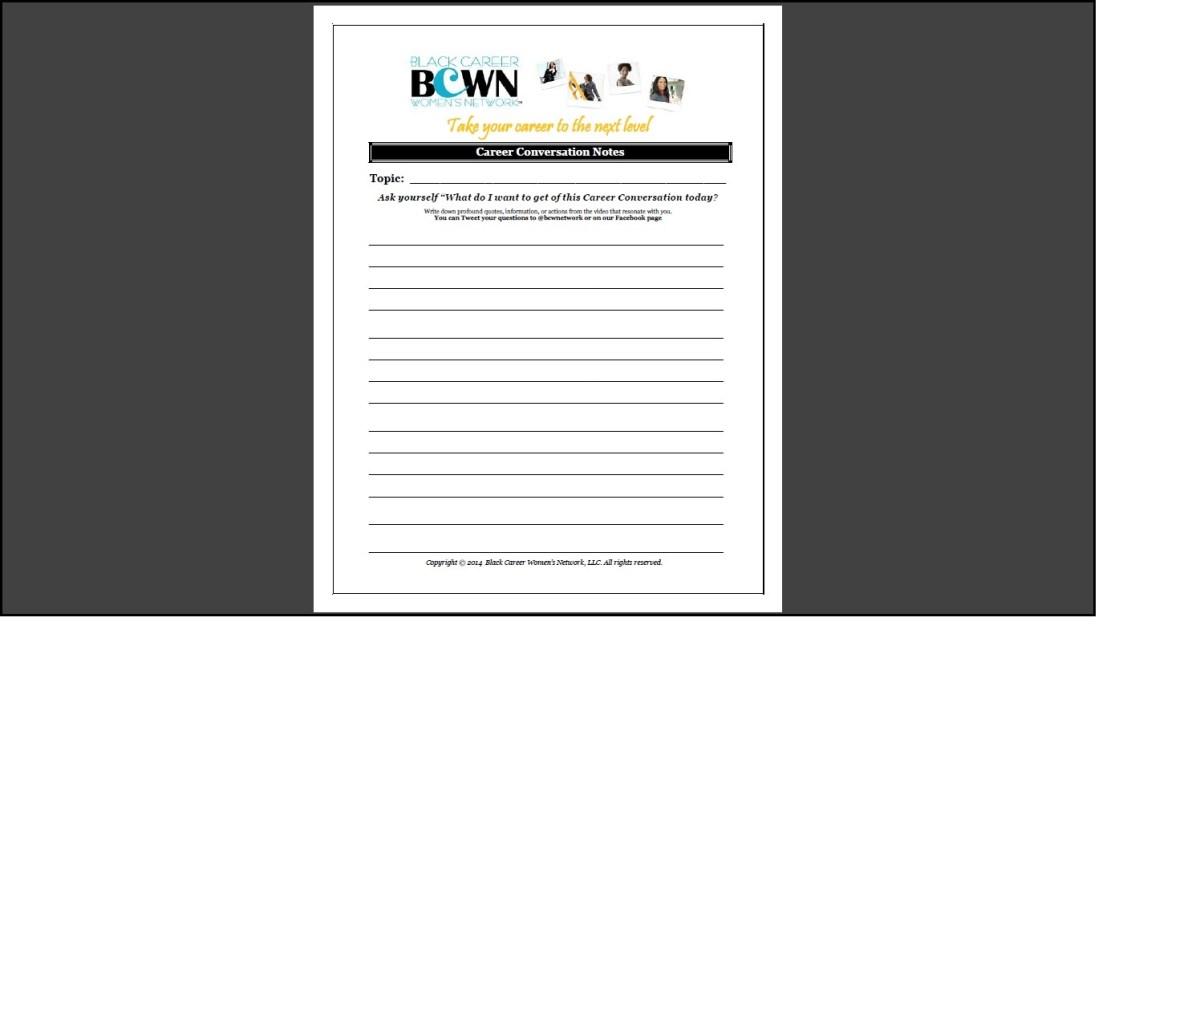 Career Conversation Note Sheet